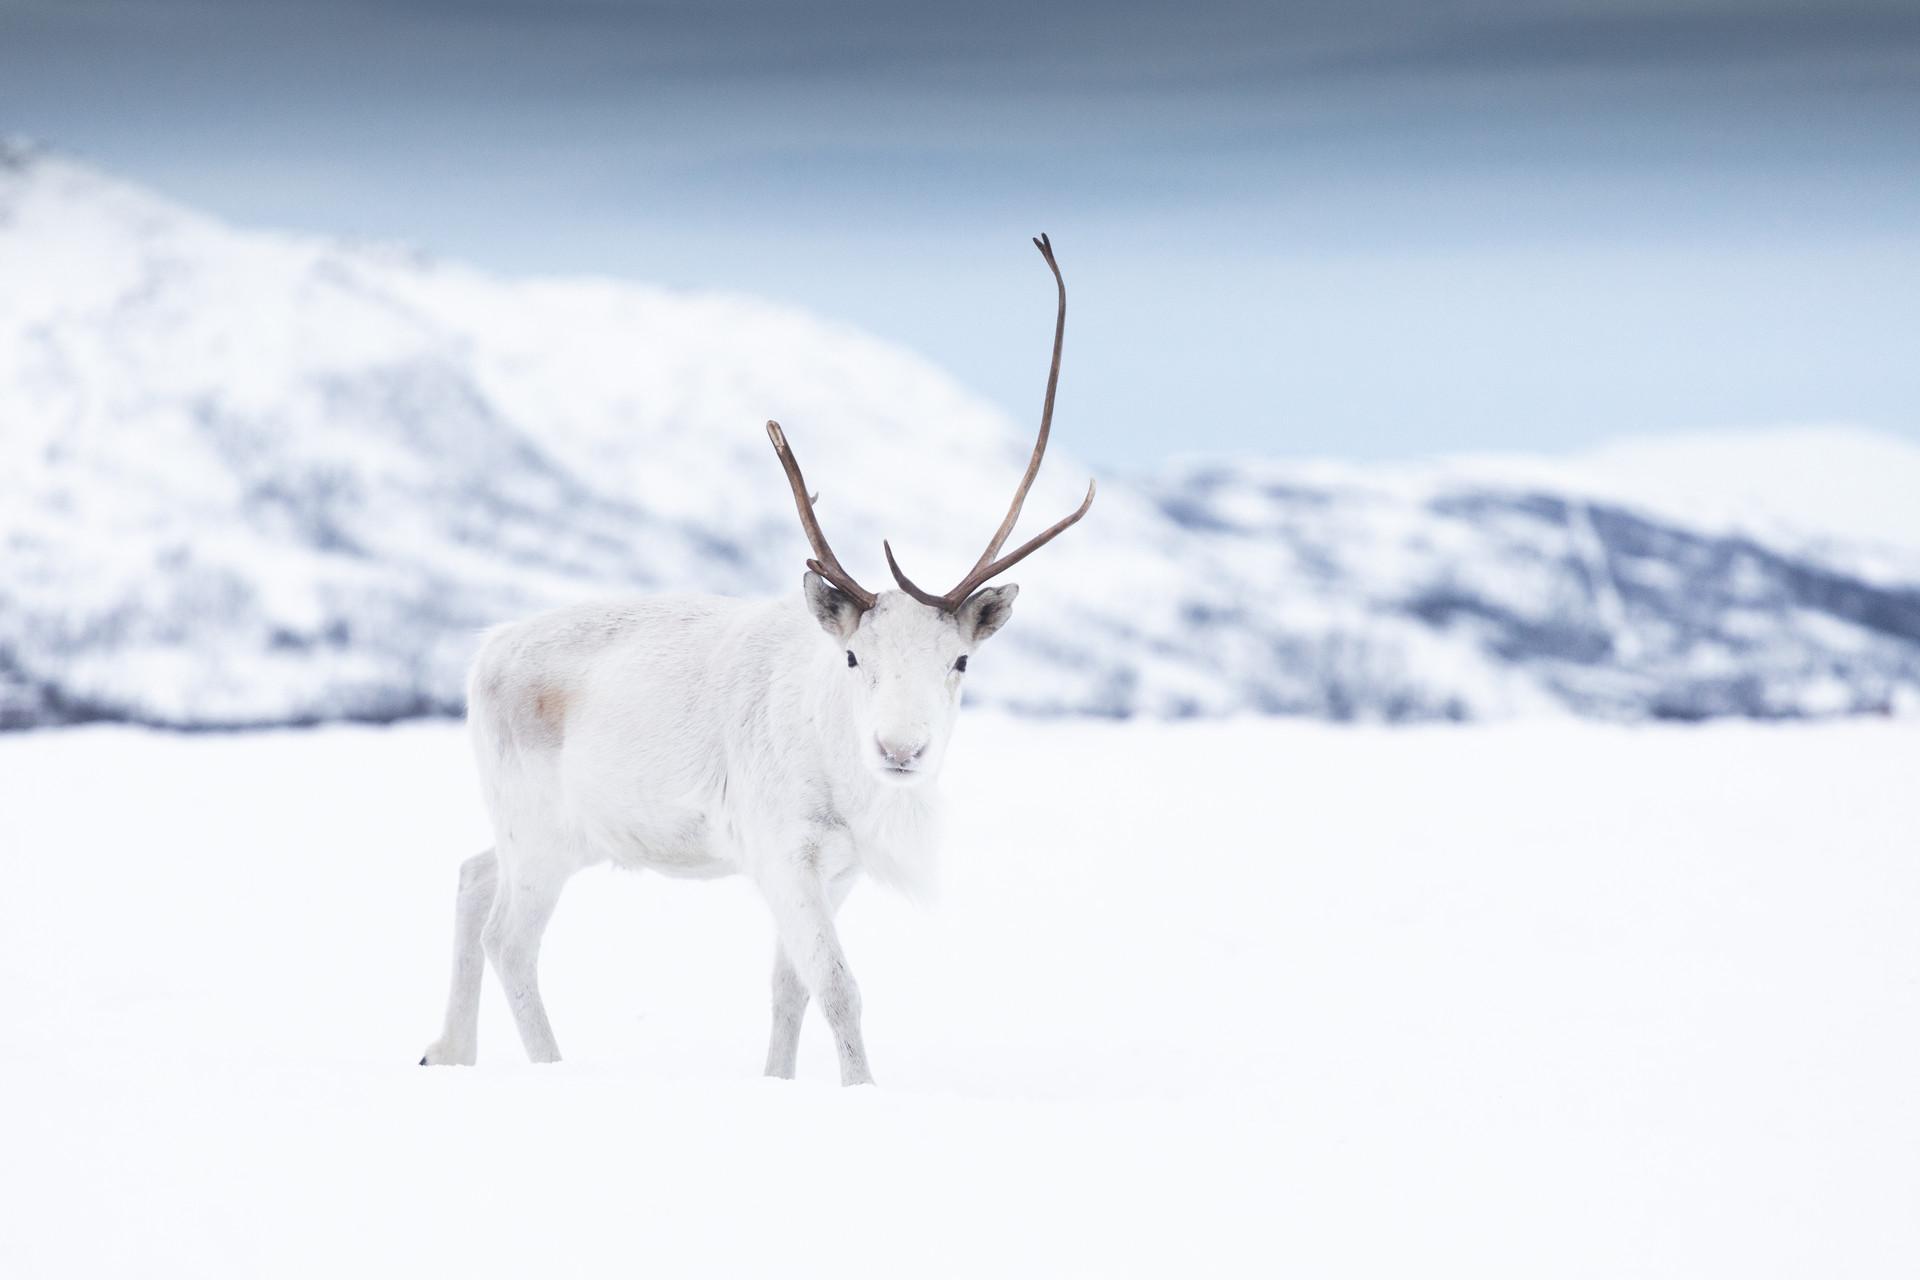 Arctic reindeer Jenni Lisacek photography Norway